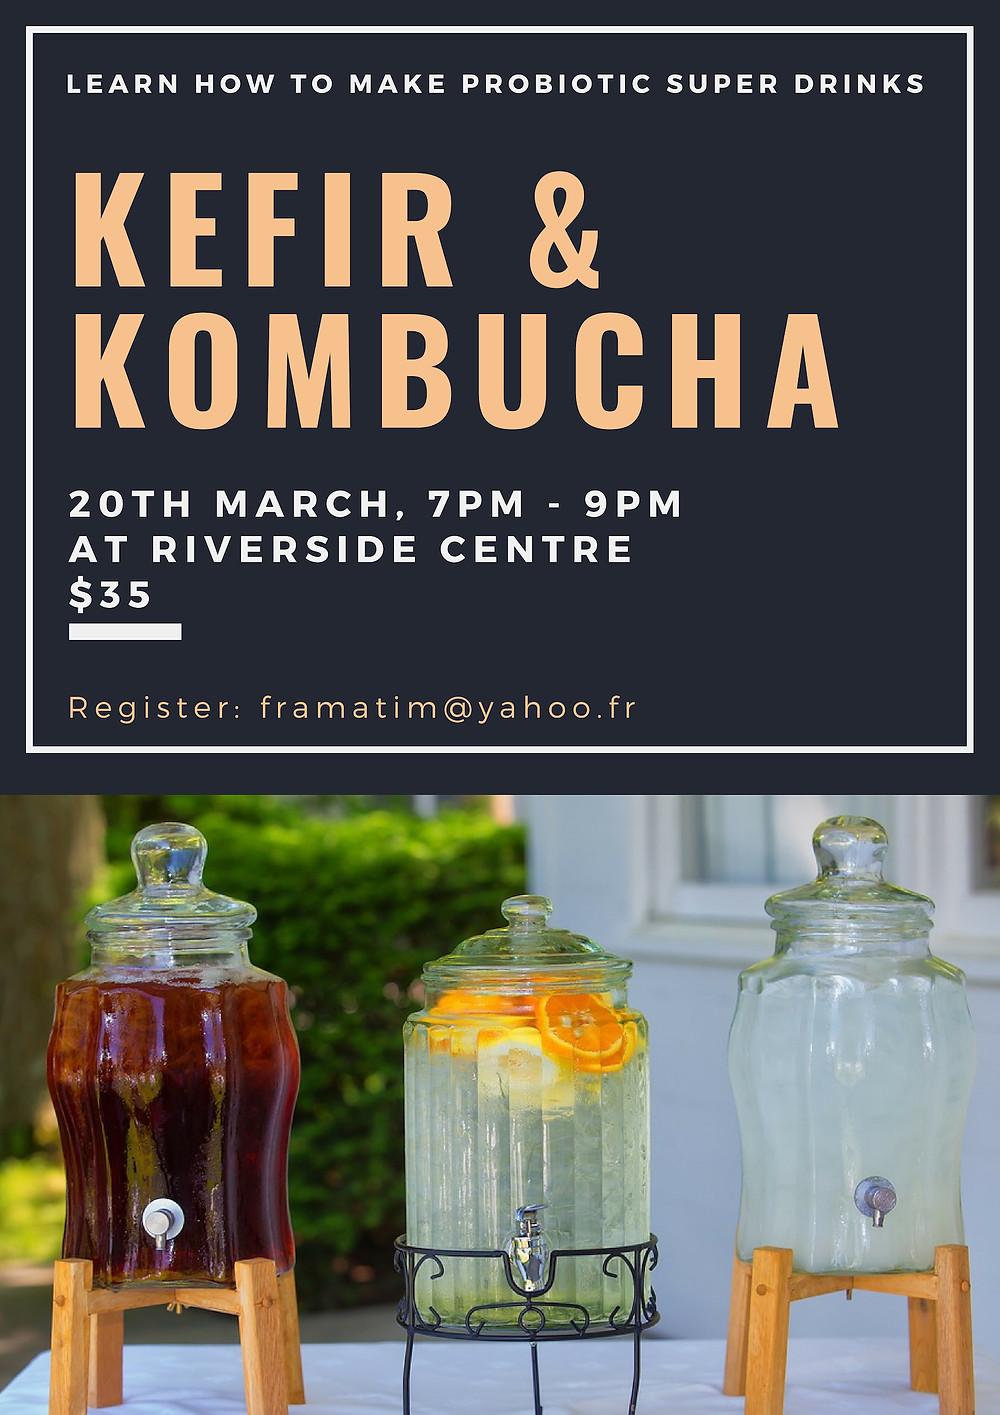 Kefir & Kombucha Workshop Poster